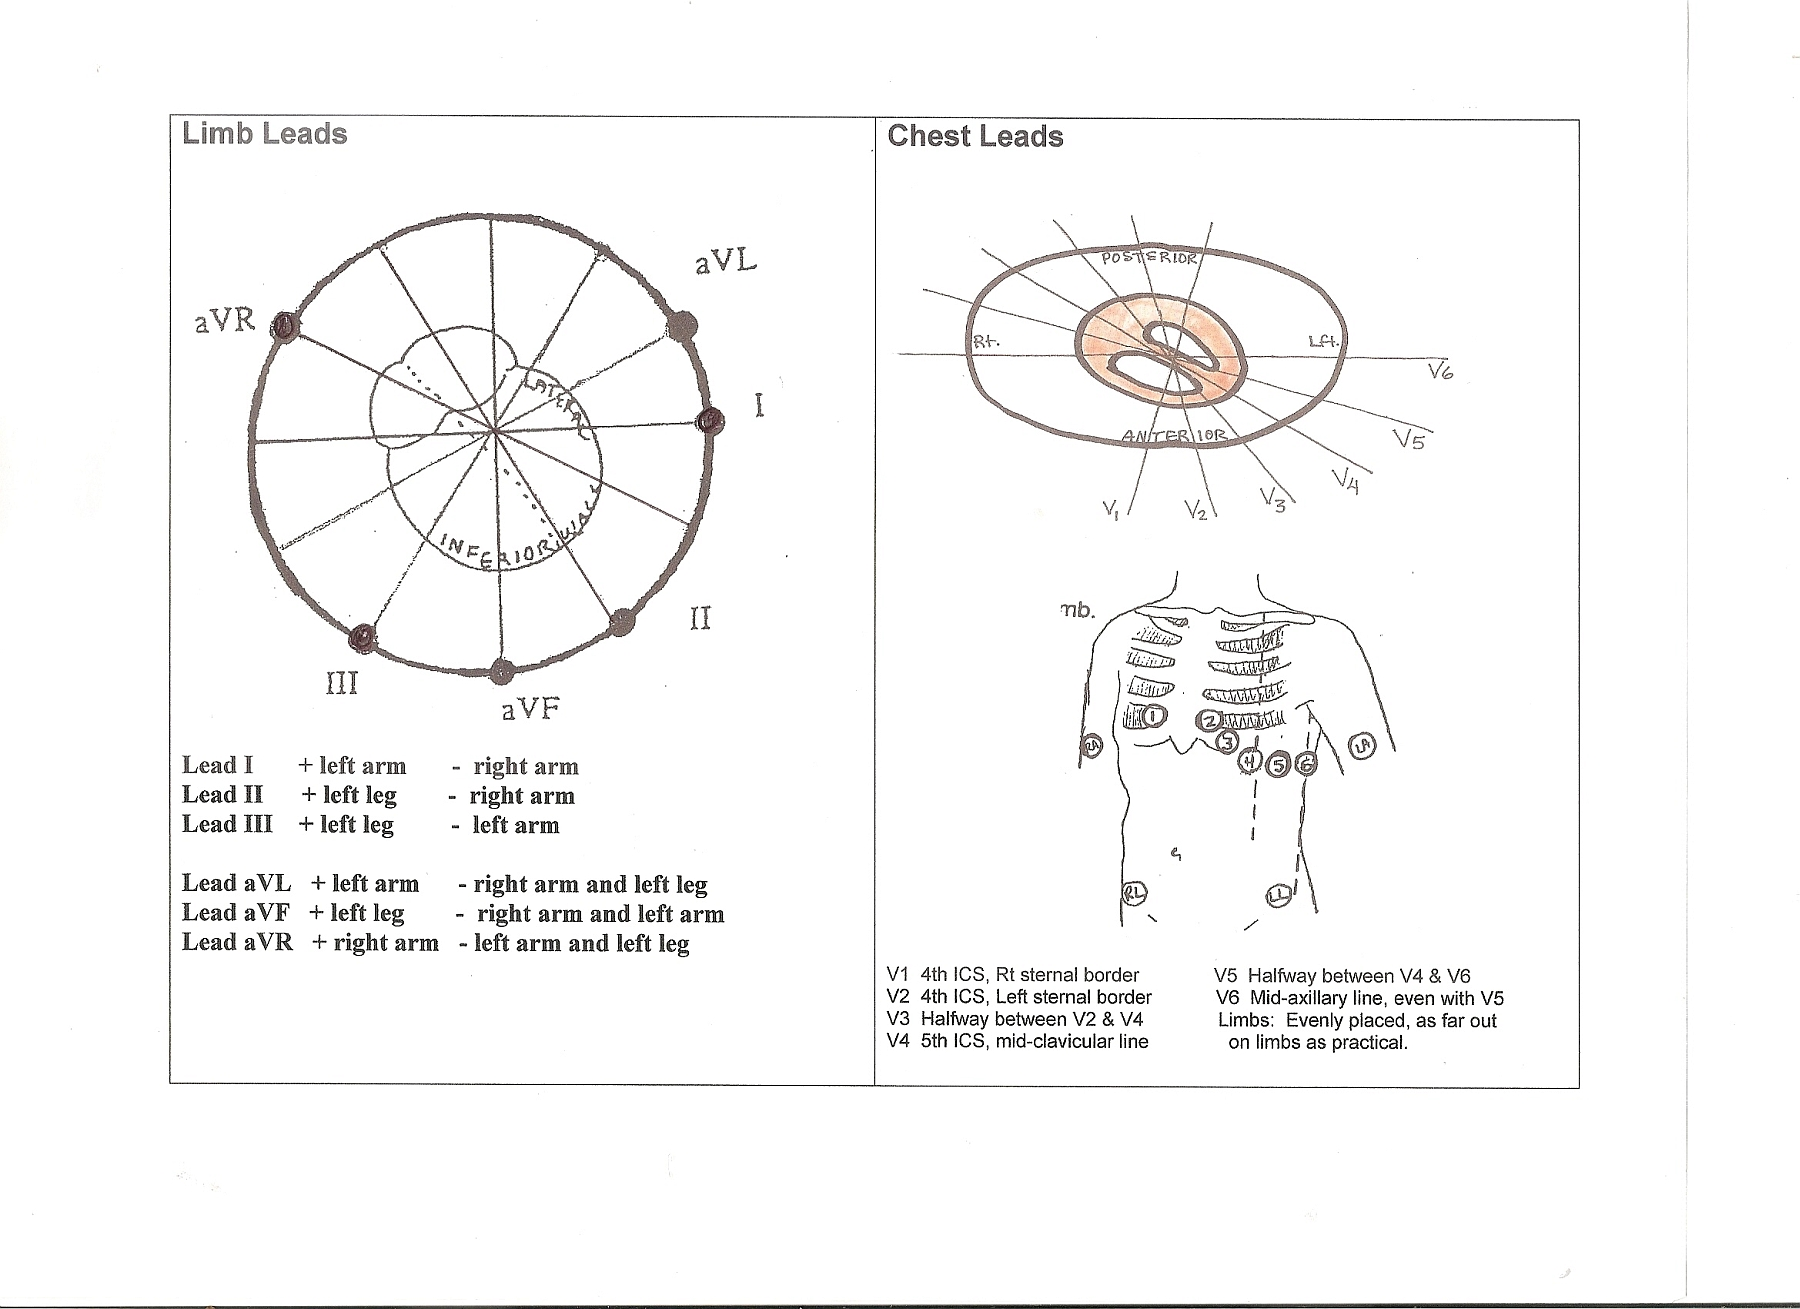 Diagram Of Frontal Amp Horizontal Plane Leads